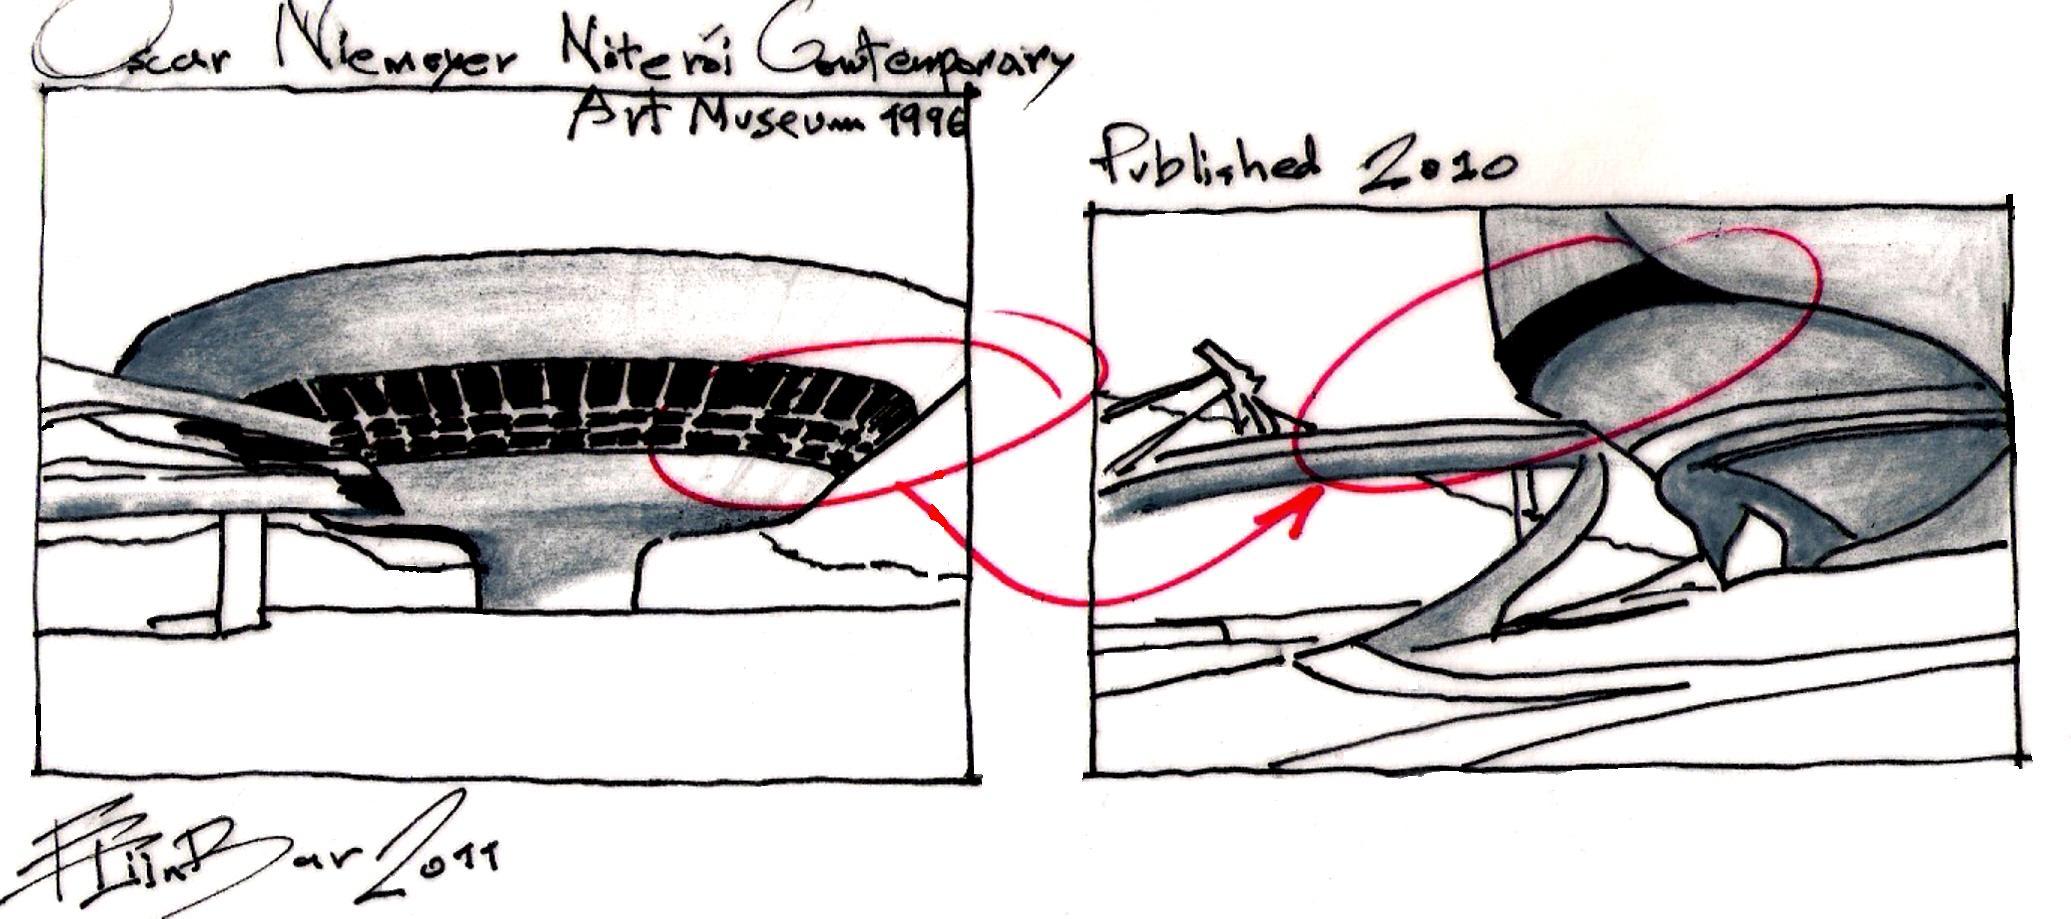 Oscar Niemeyer Eliinbar Sketches 20110001 Someone Has